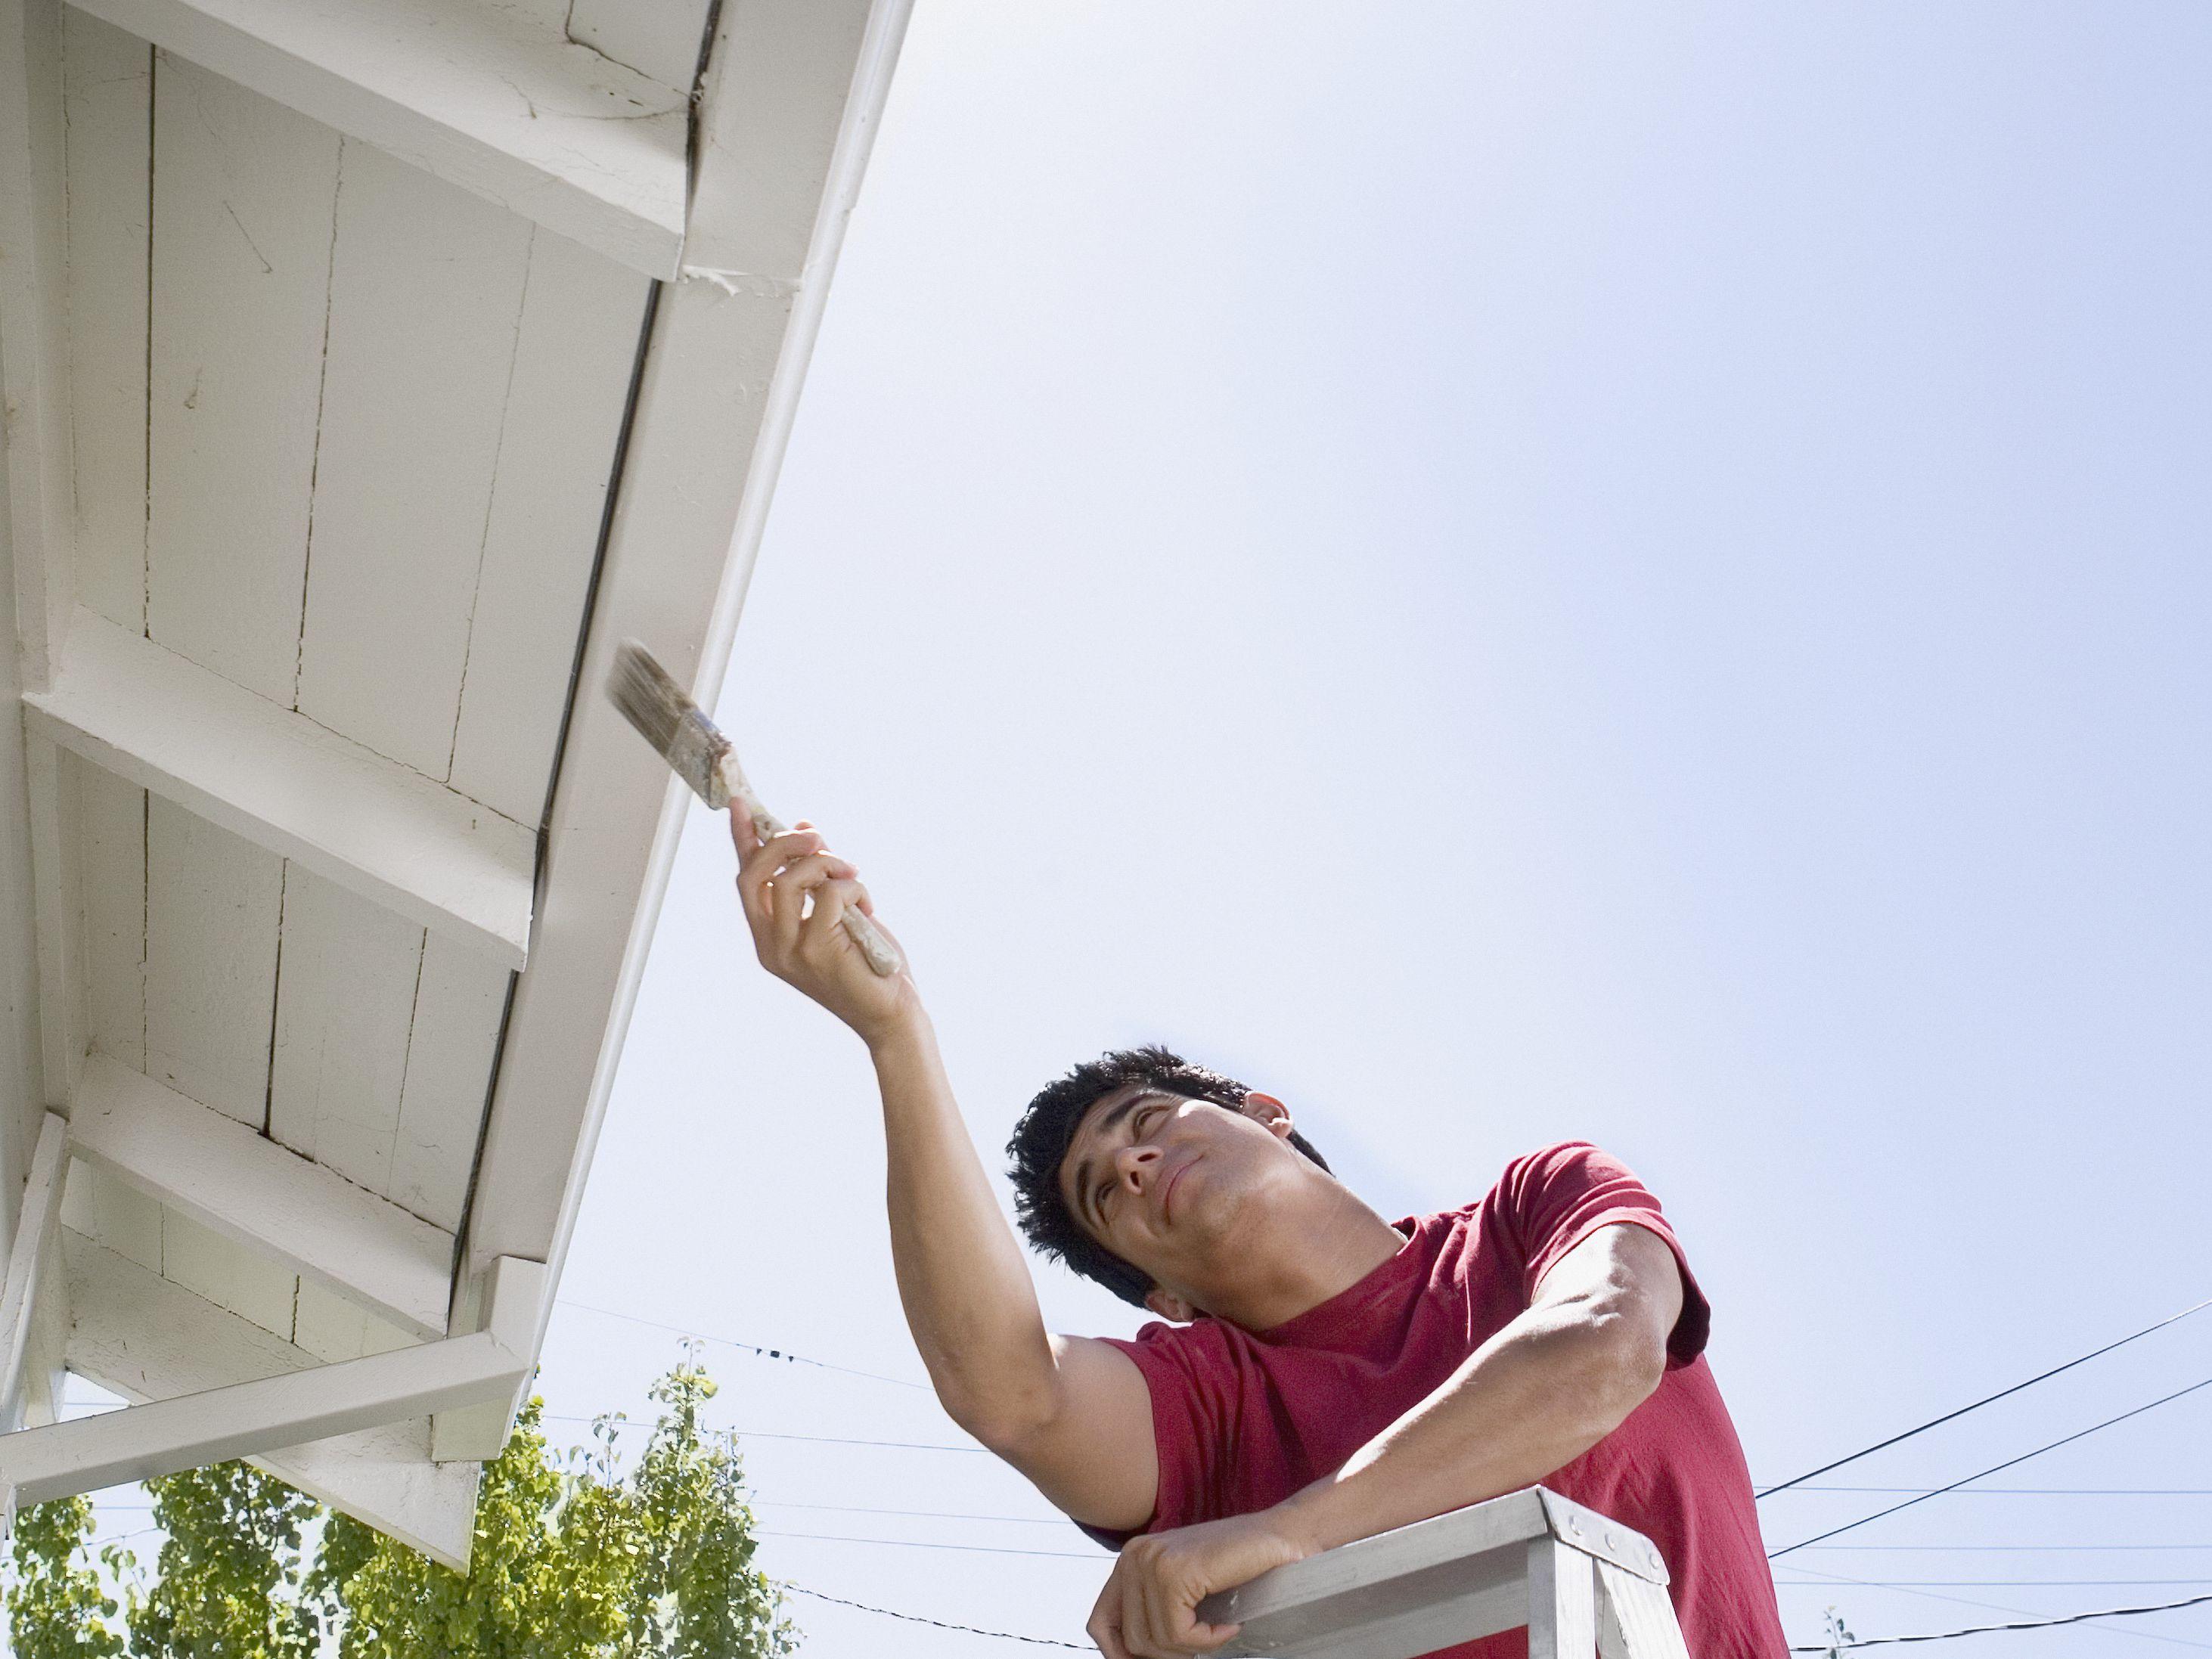 Brush Vs Sprayer For Painting A House Exterior